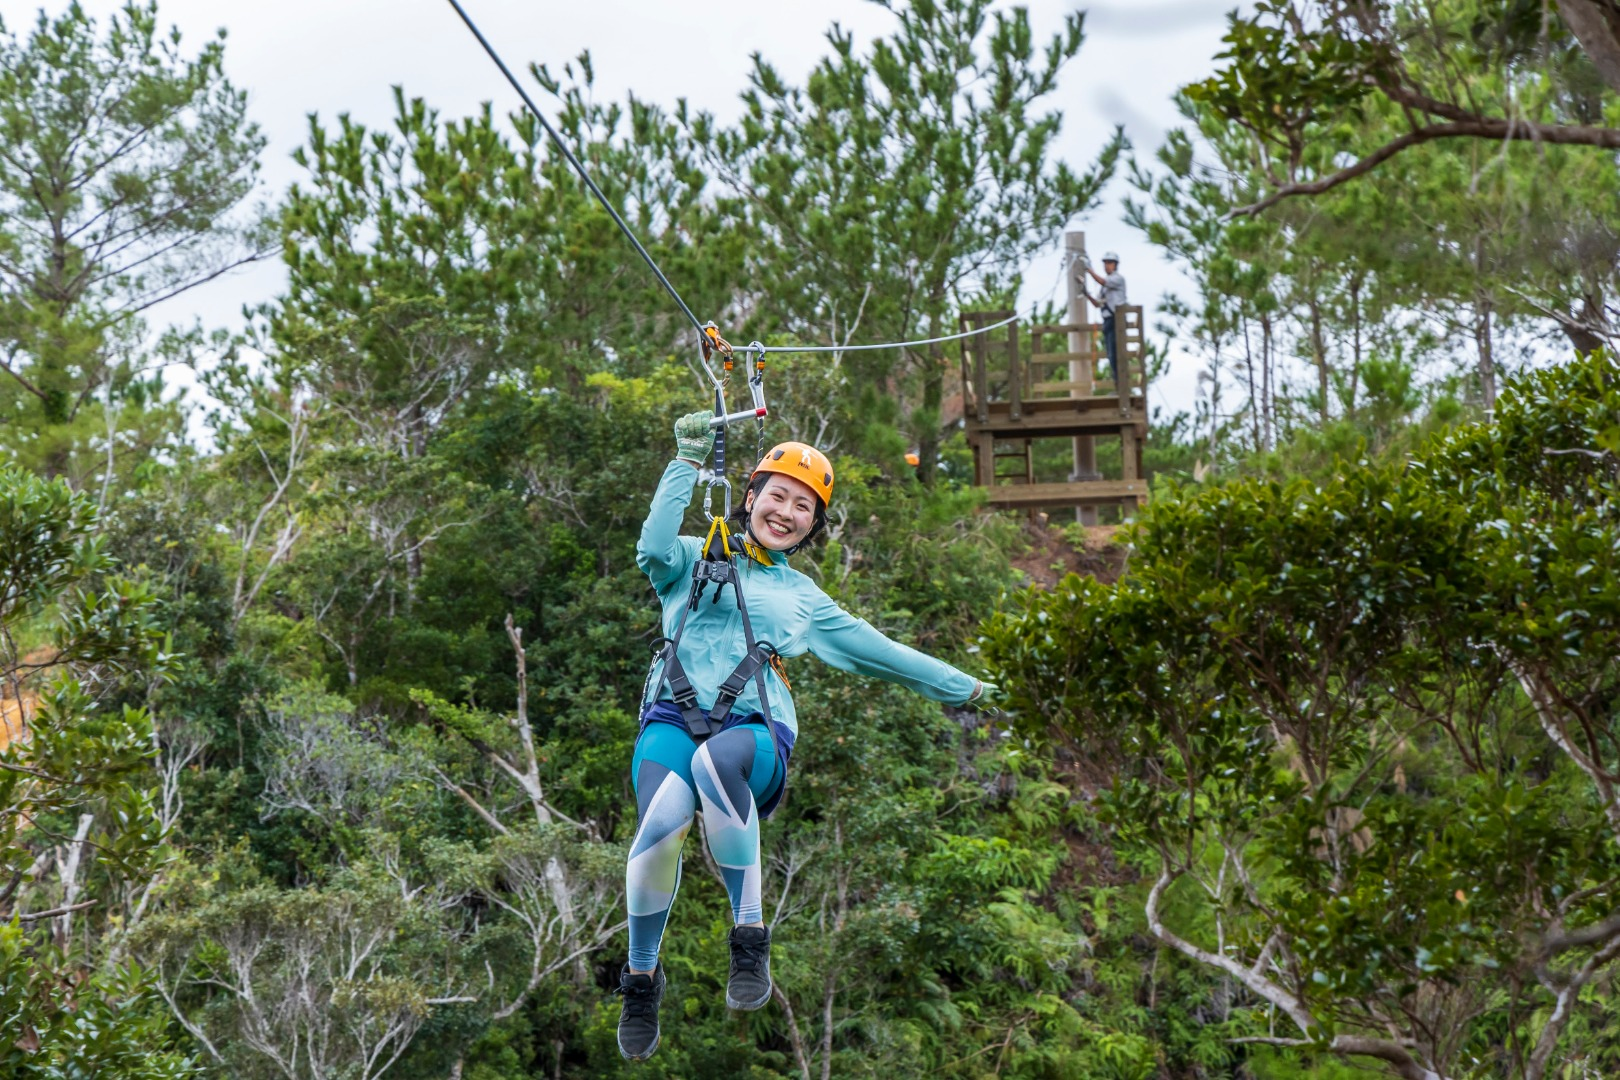 Okinawa Fly Zipline Experience At Matayoshi Coffee Farm Live Japan Japanese Travel Sightseeing And Experience Guide